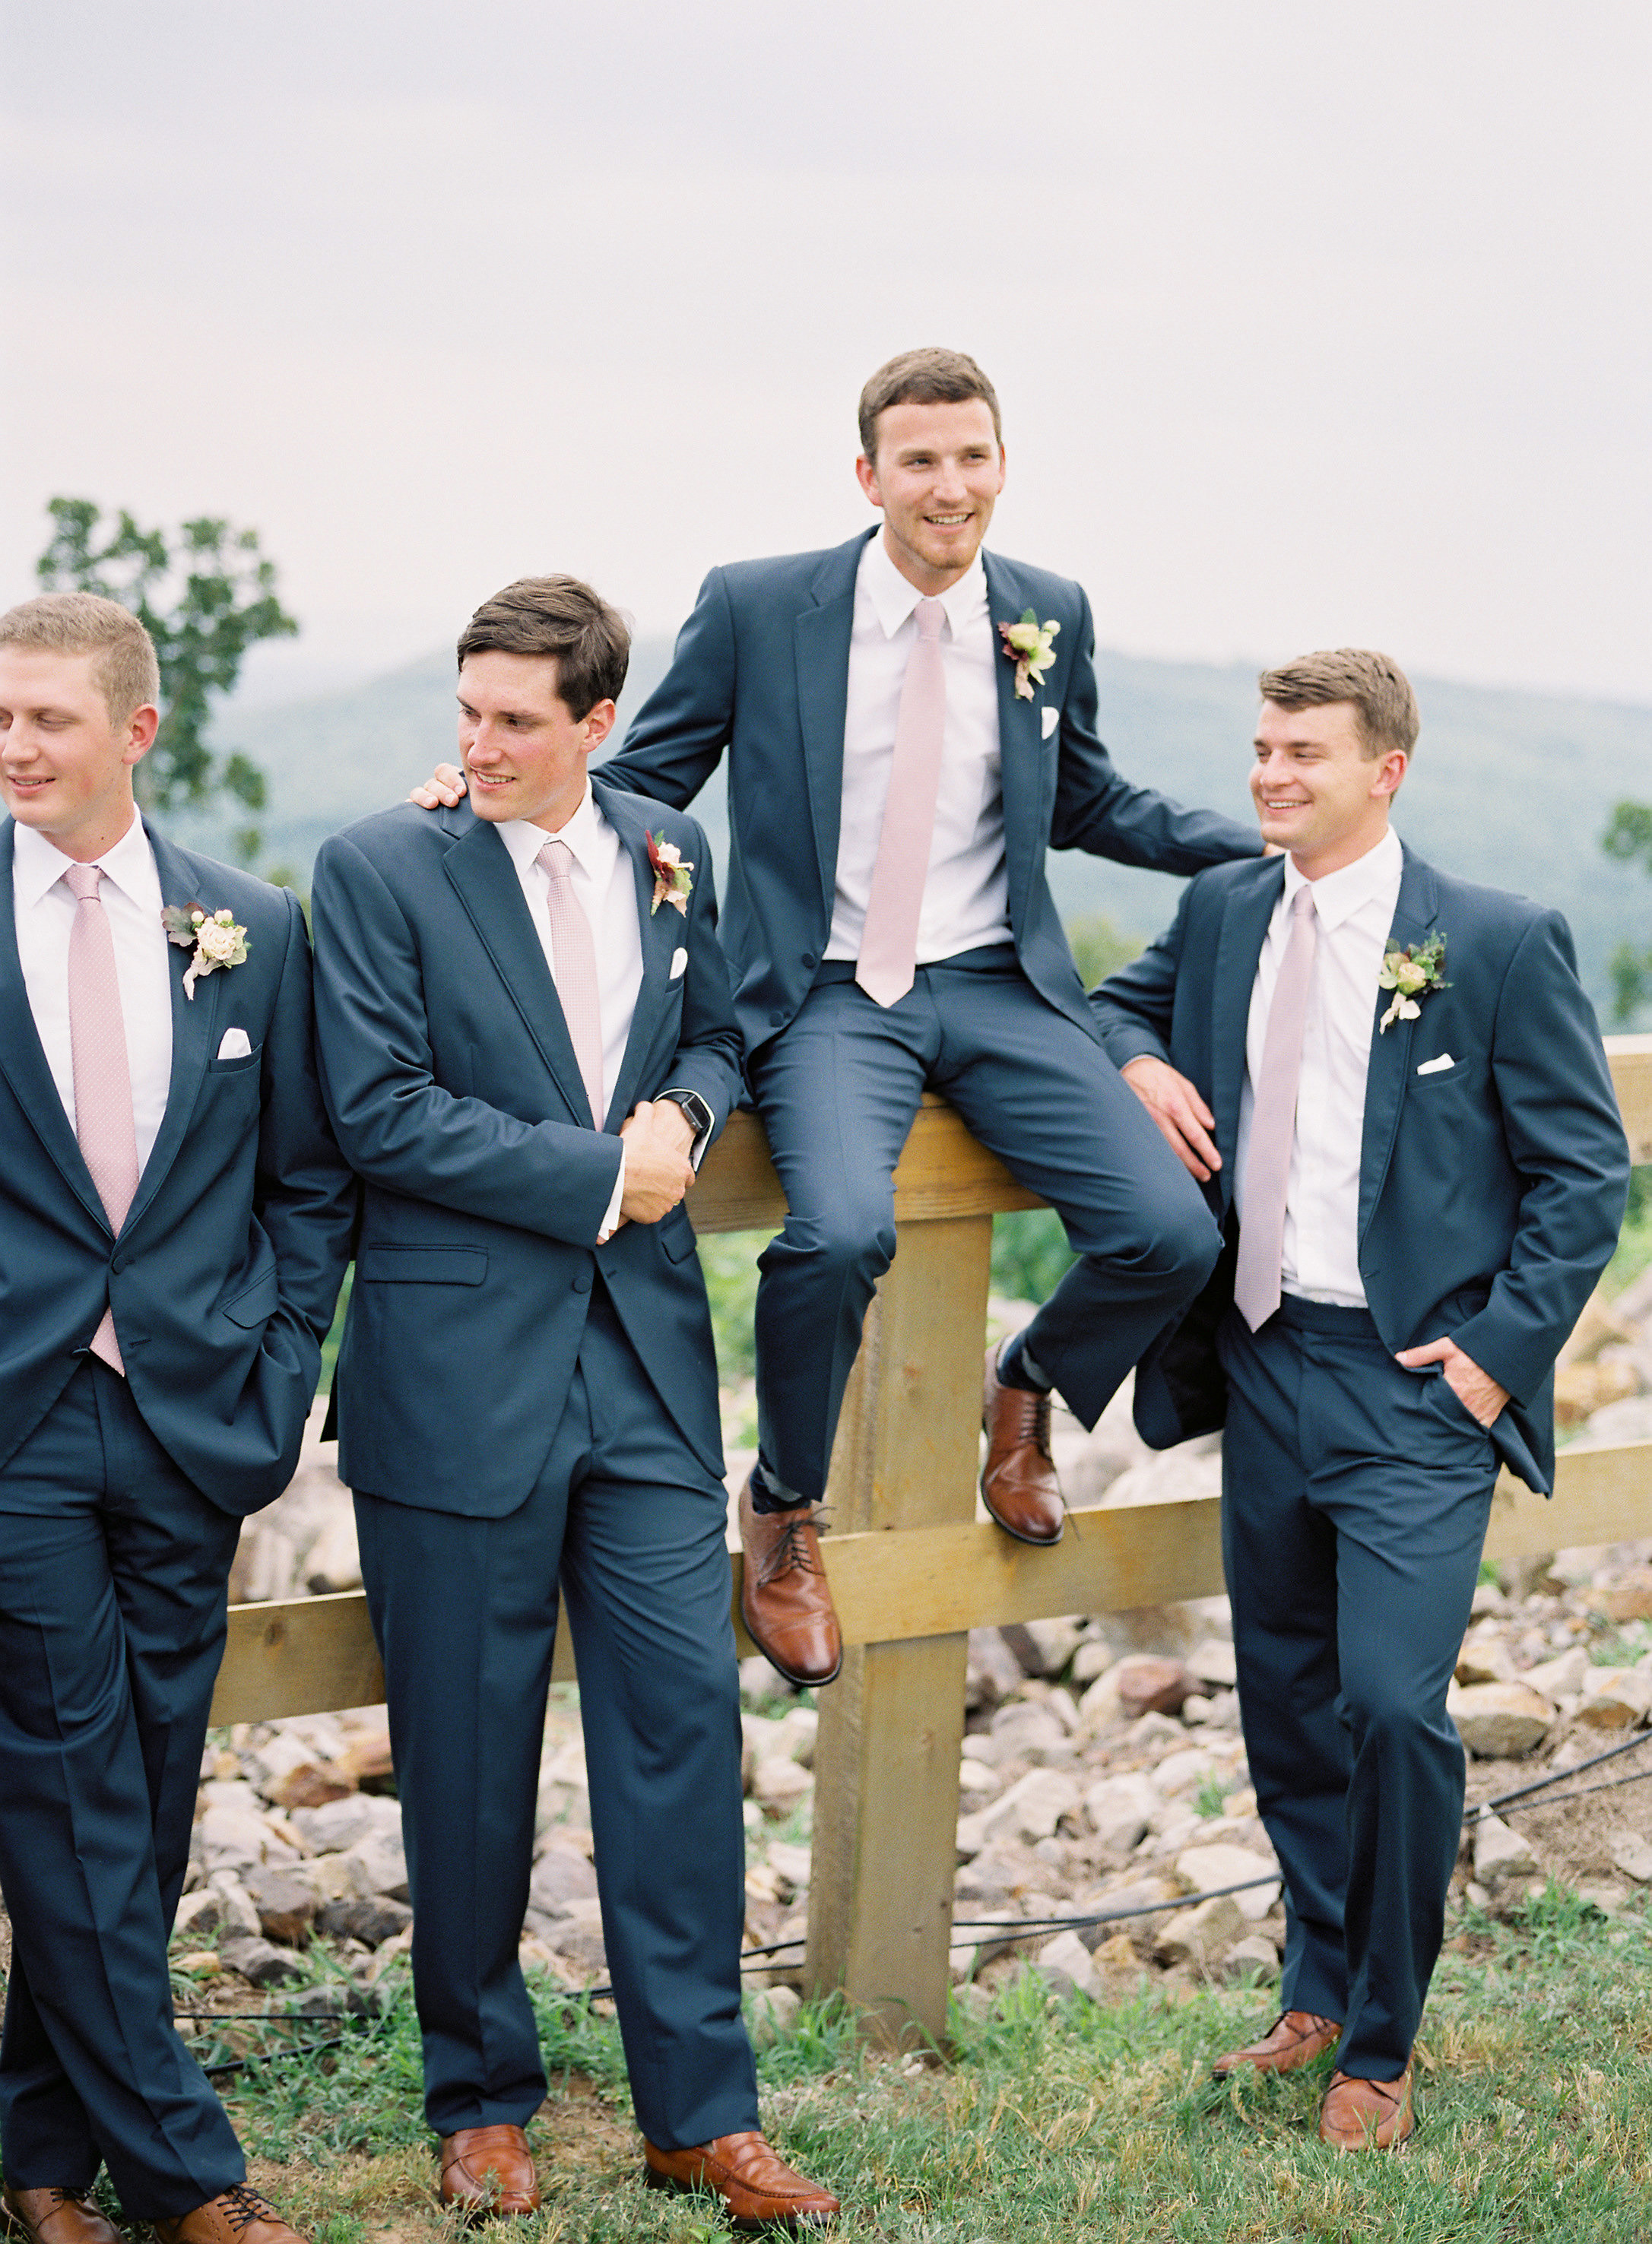 groom outdoors fence with groomsmen